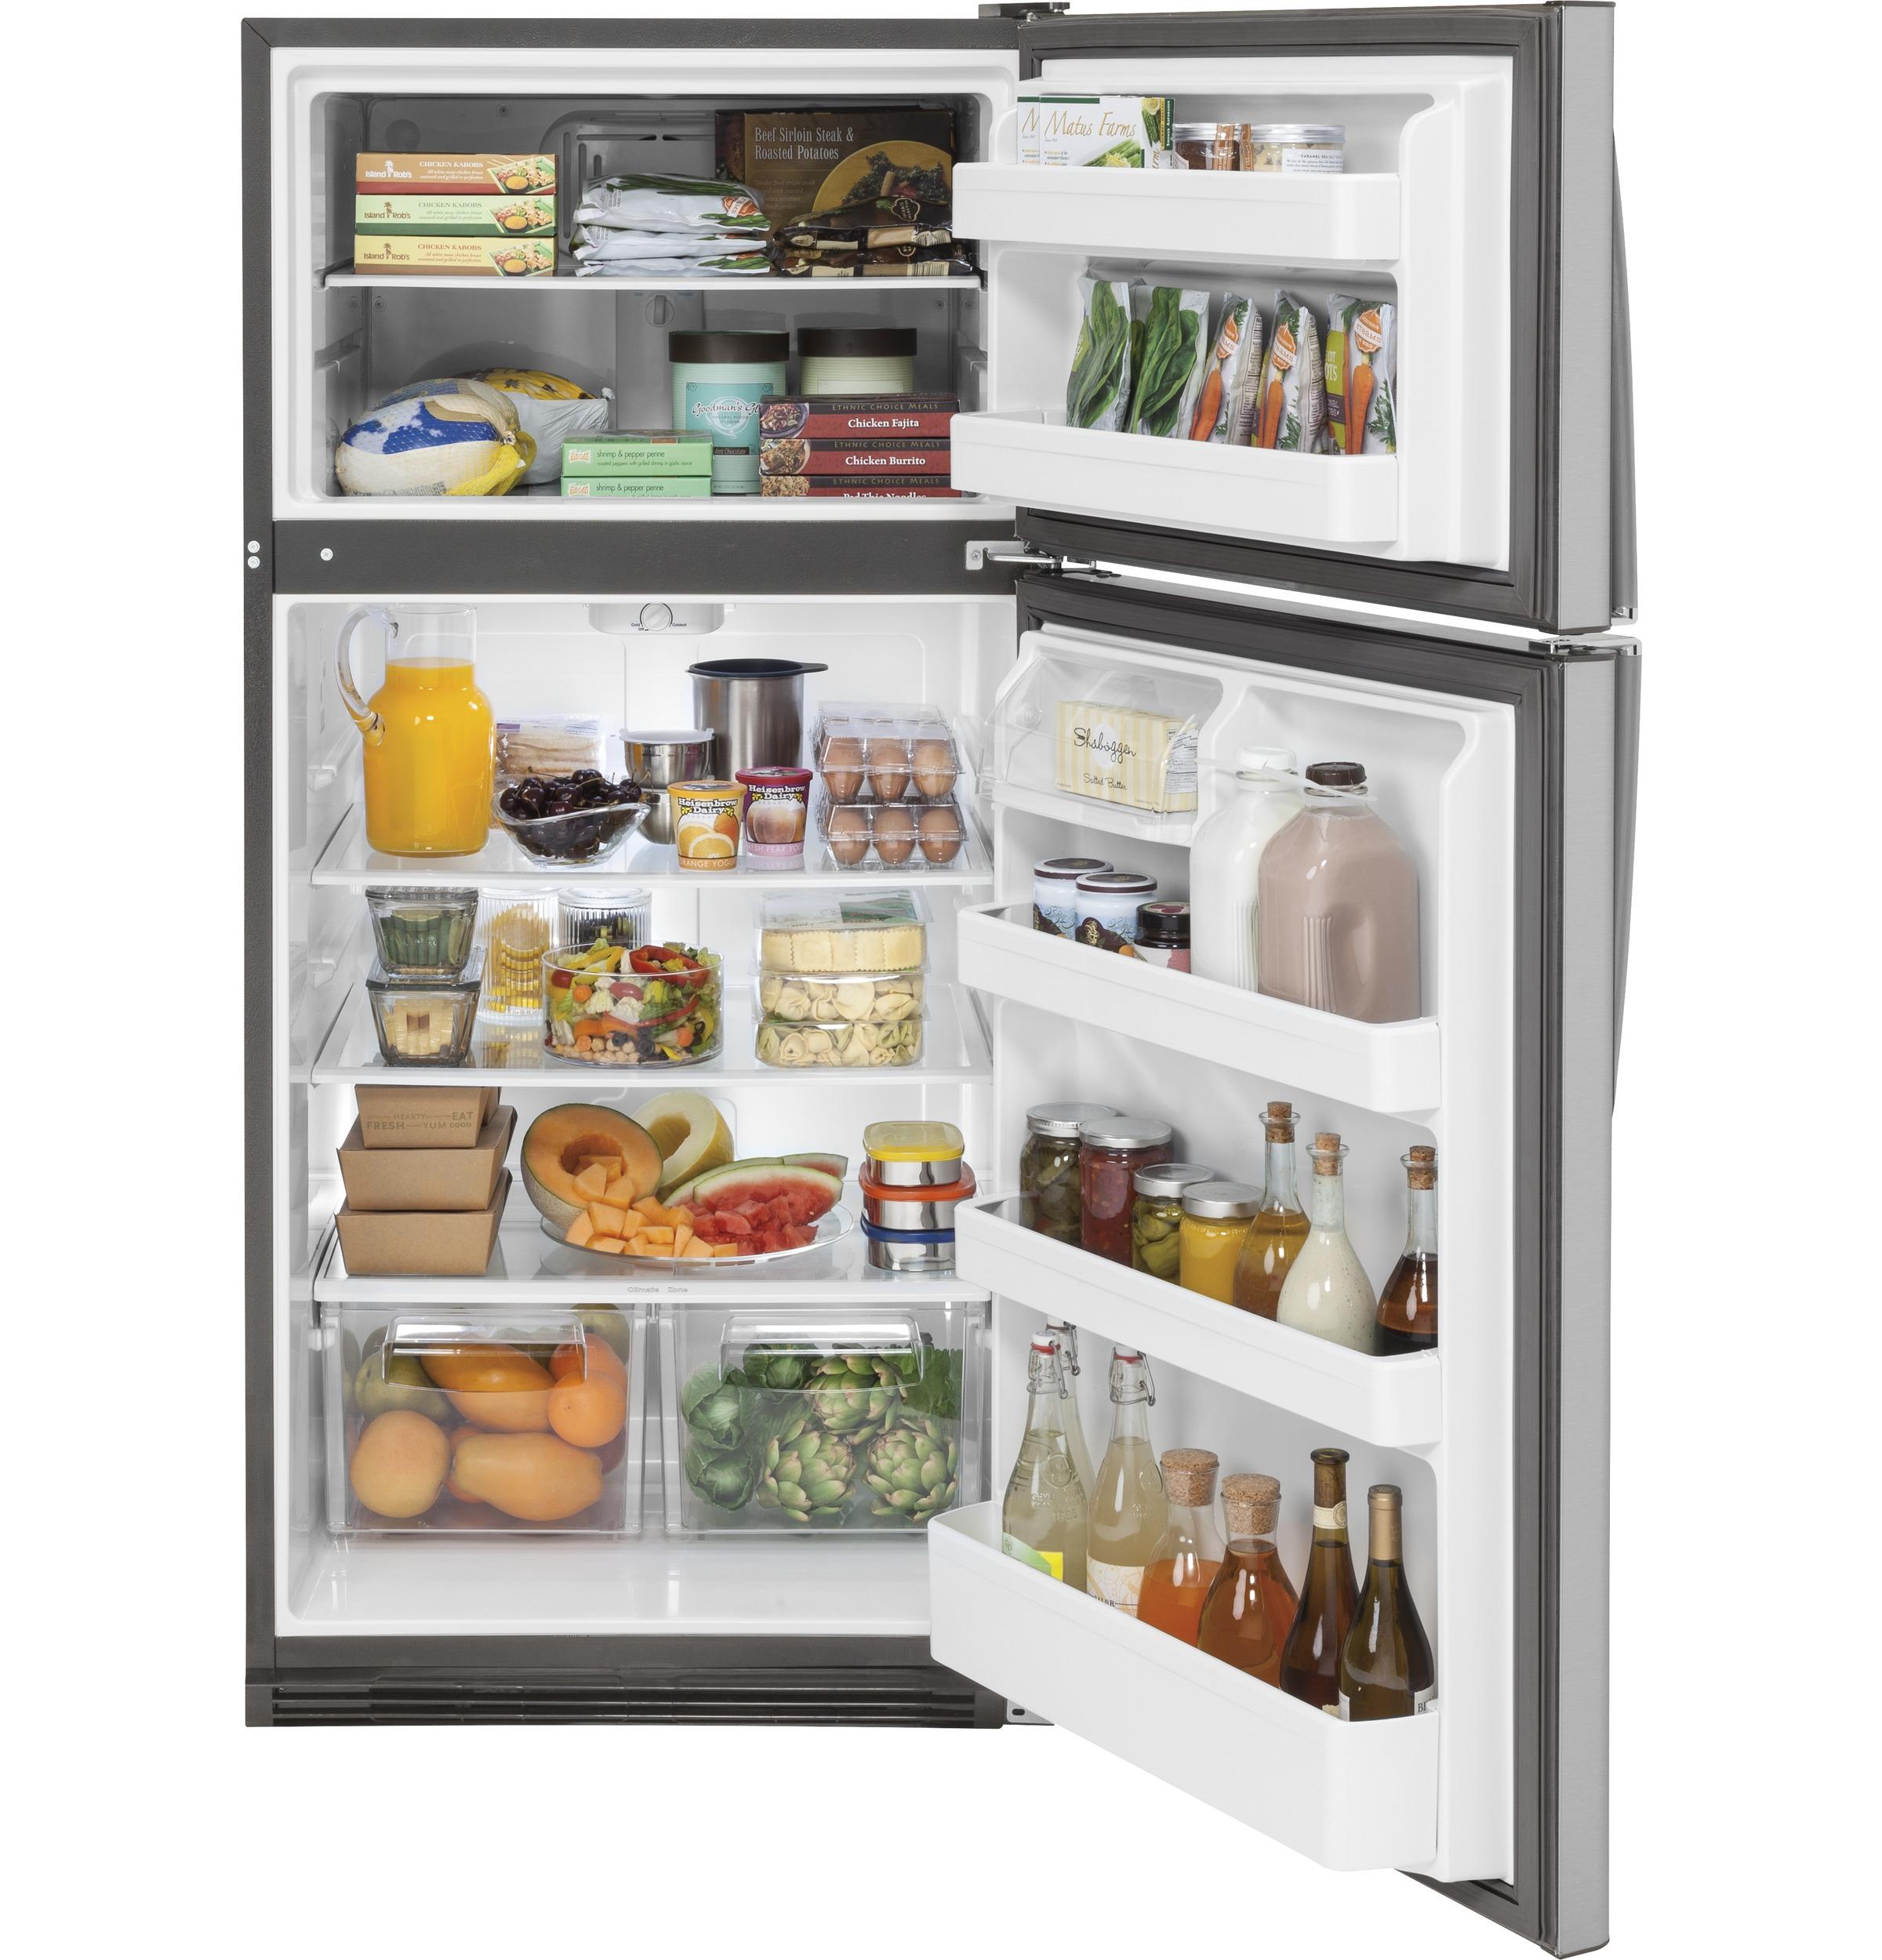 Model: GTS21FSKSS | GE GE® 20.8 Cu. Ft. Top-Freezer Refrigerator